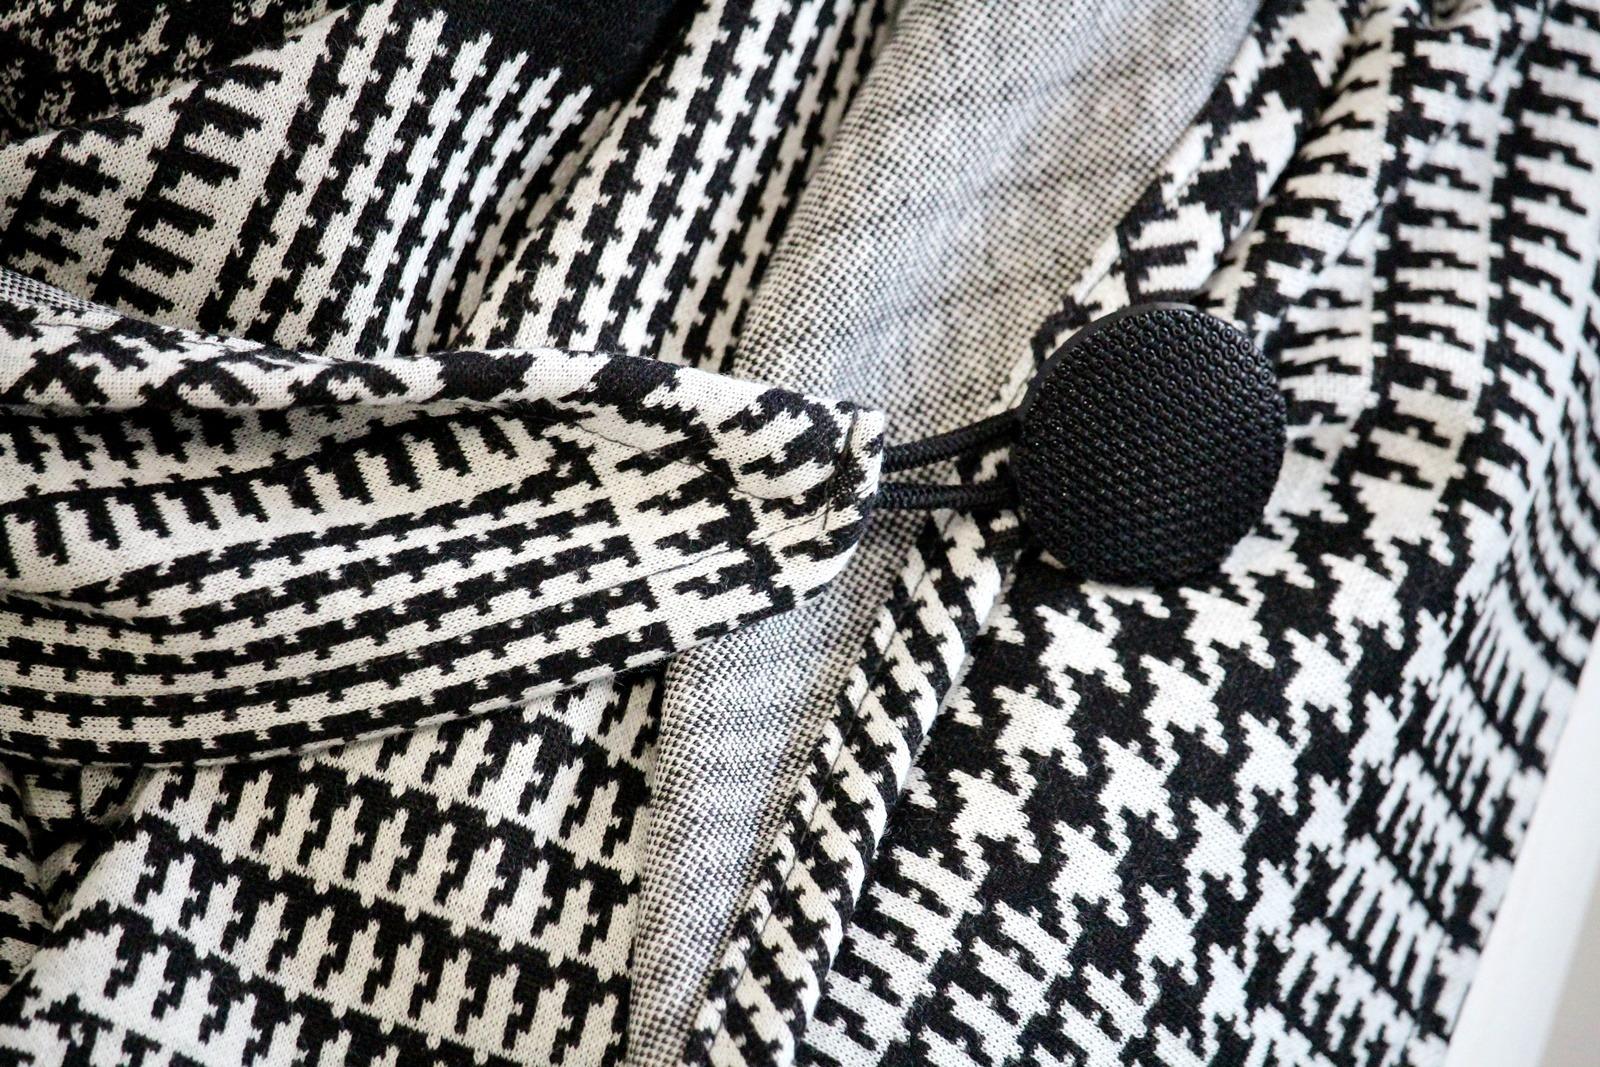 XXL Dreieckstuch Fashionable 3